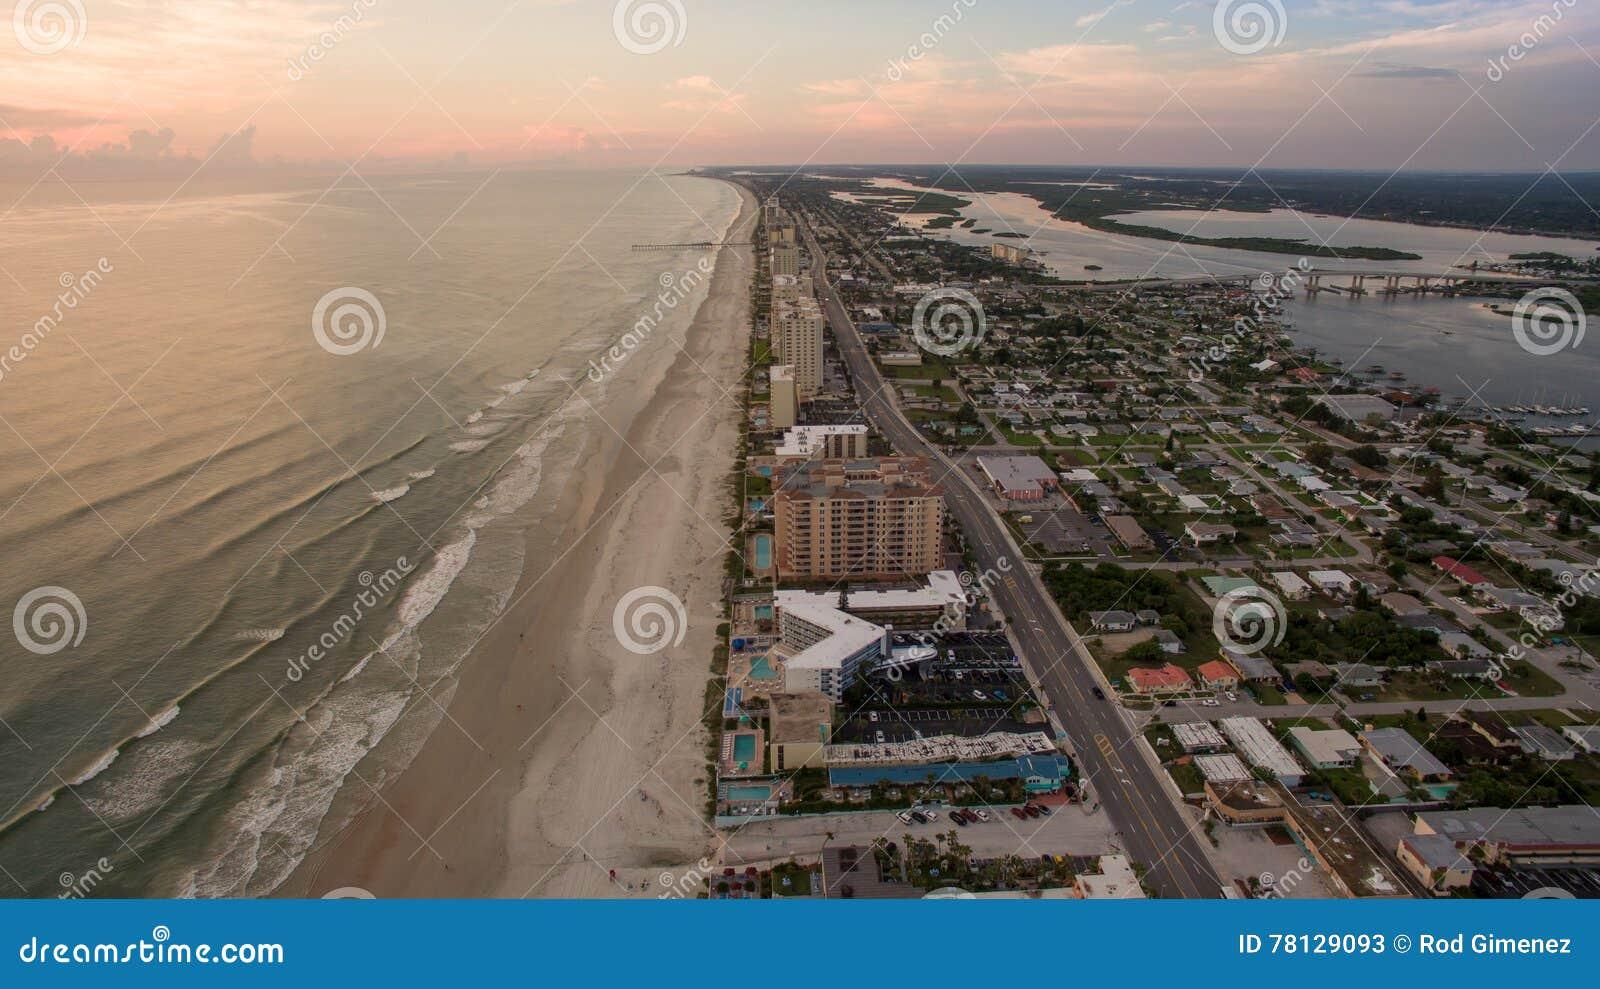 Aerial view of sunrise in Daytona Beach Florida